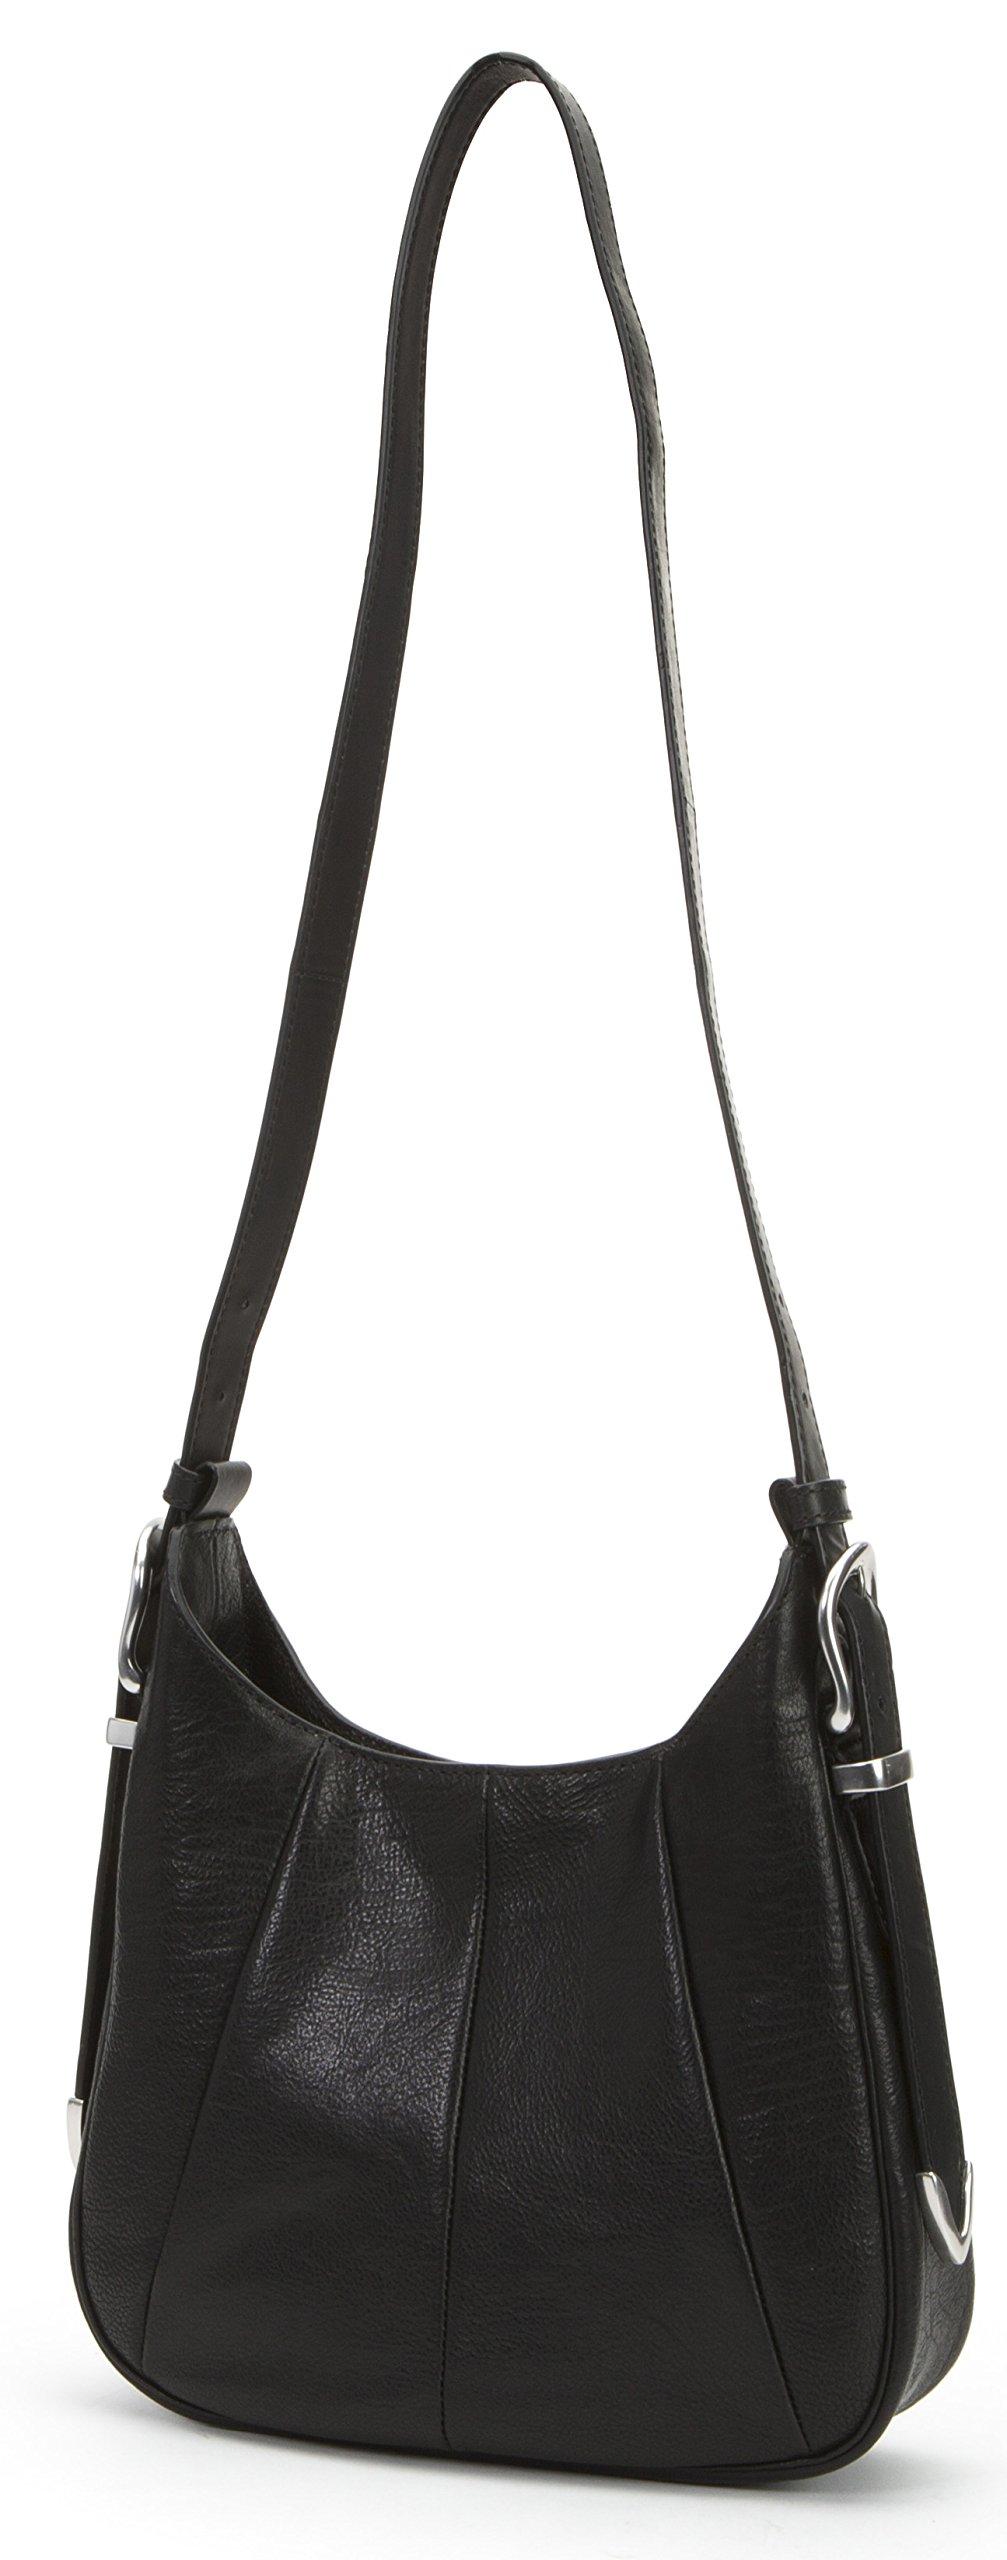 FRYE Jacqui Crossbody Leather Handbag